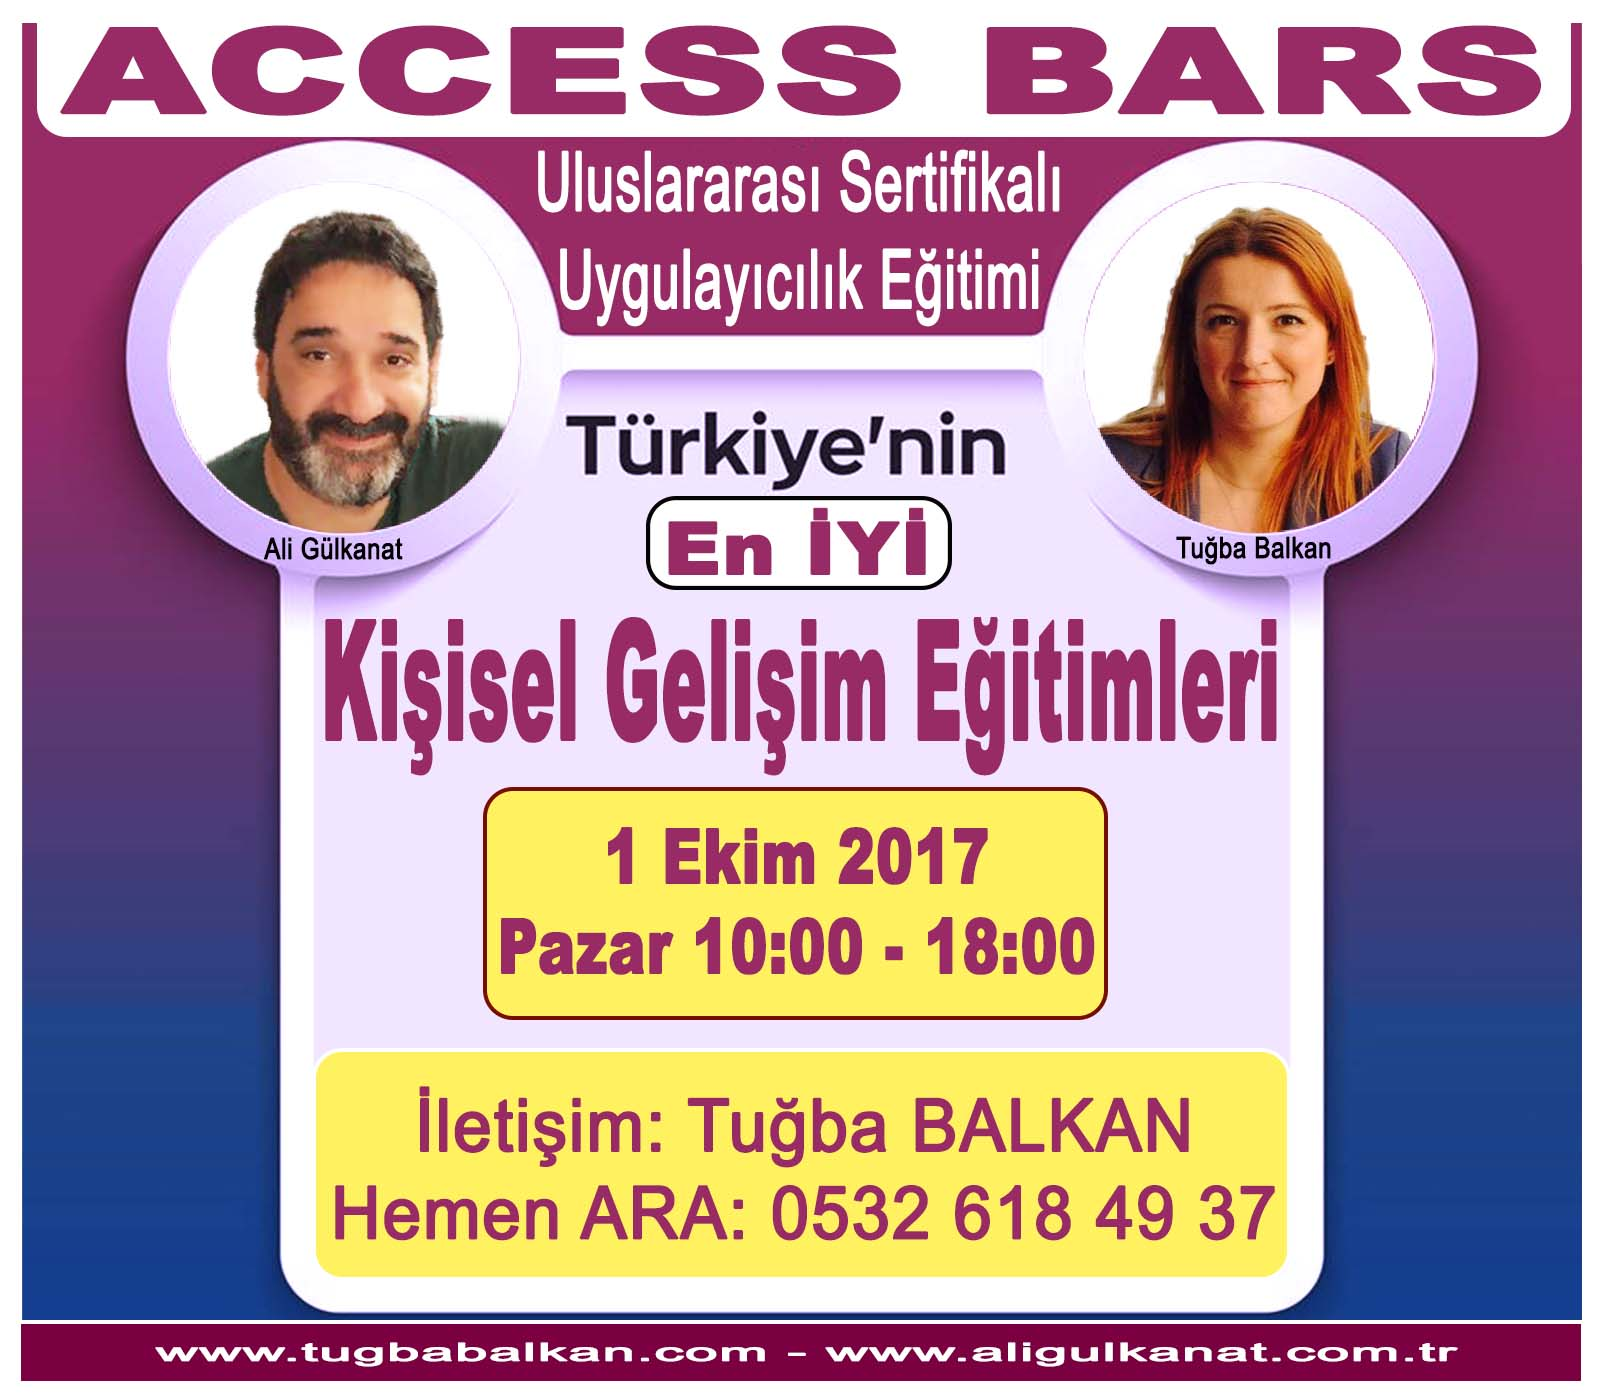 access-bars-tanitim-1-ekim-2